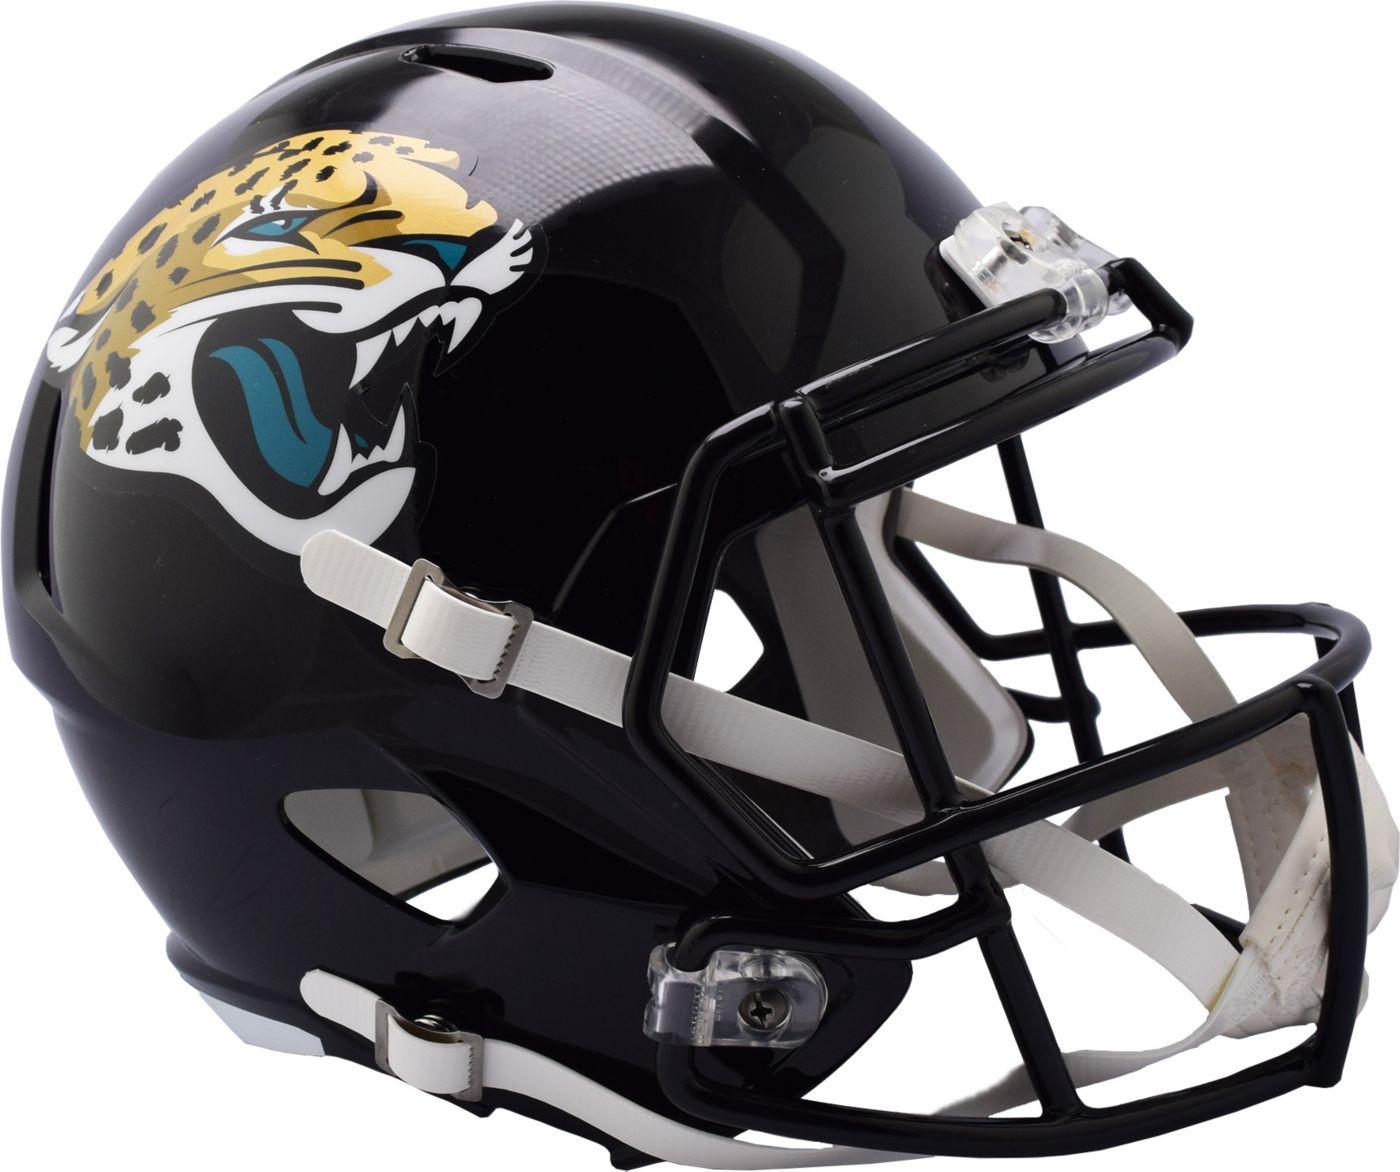 Riddell Jacksonville Jaguars Speed Replica Football Helmet